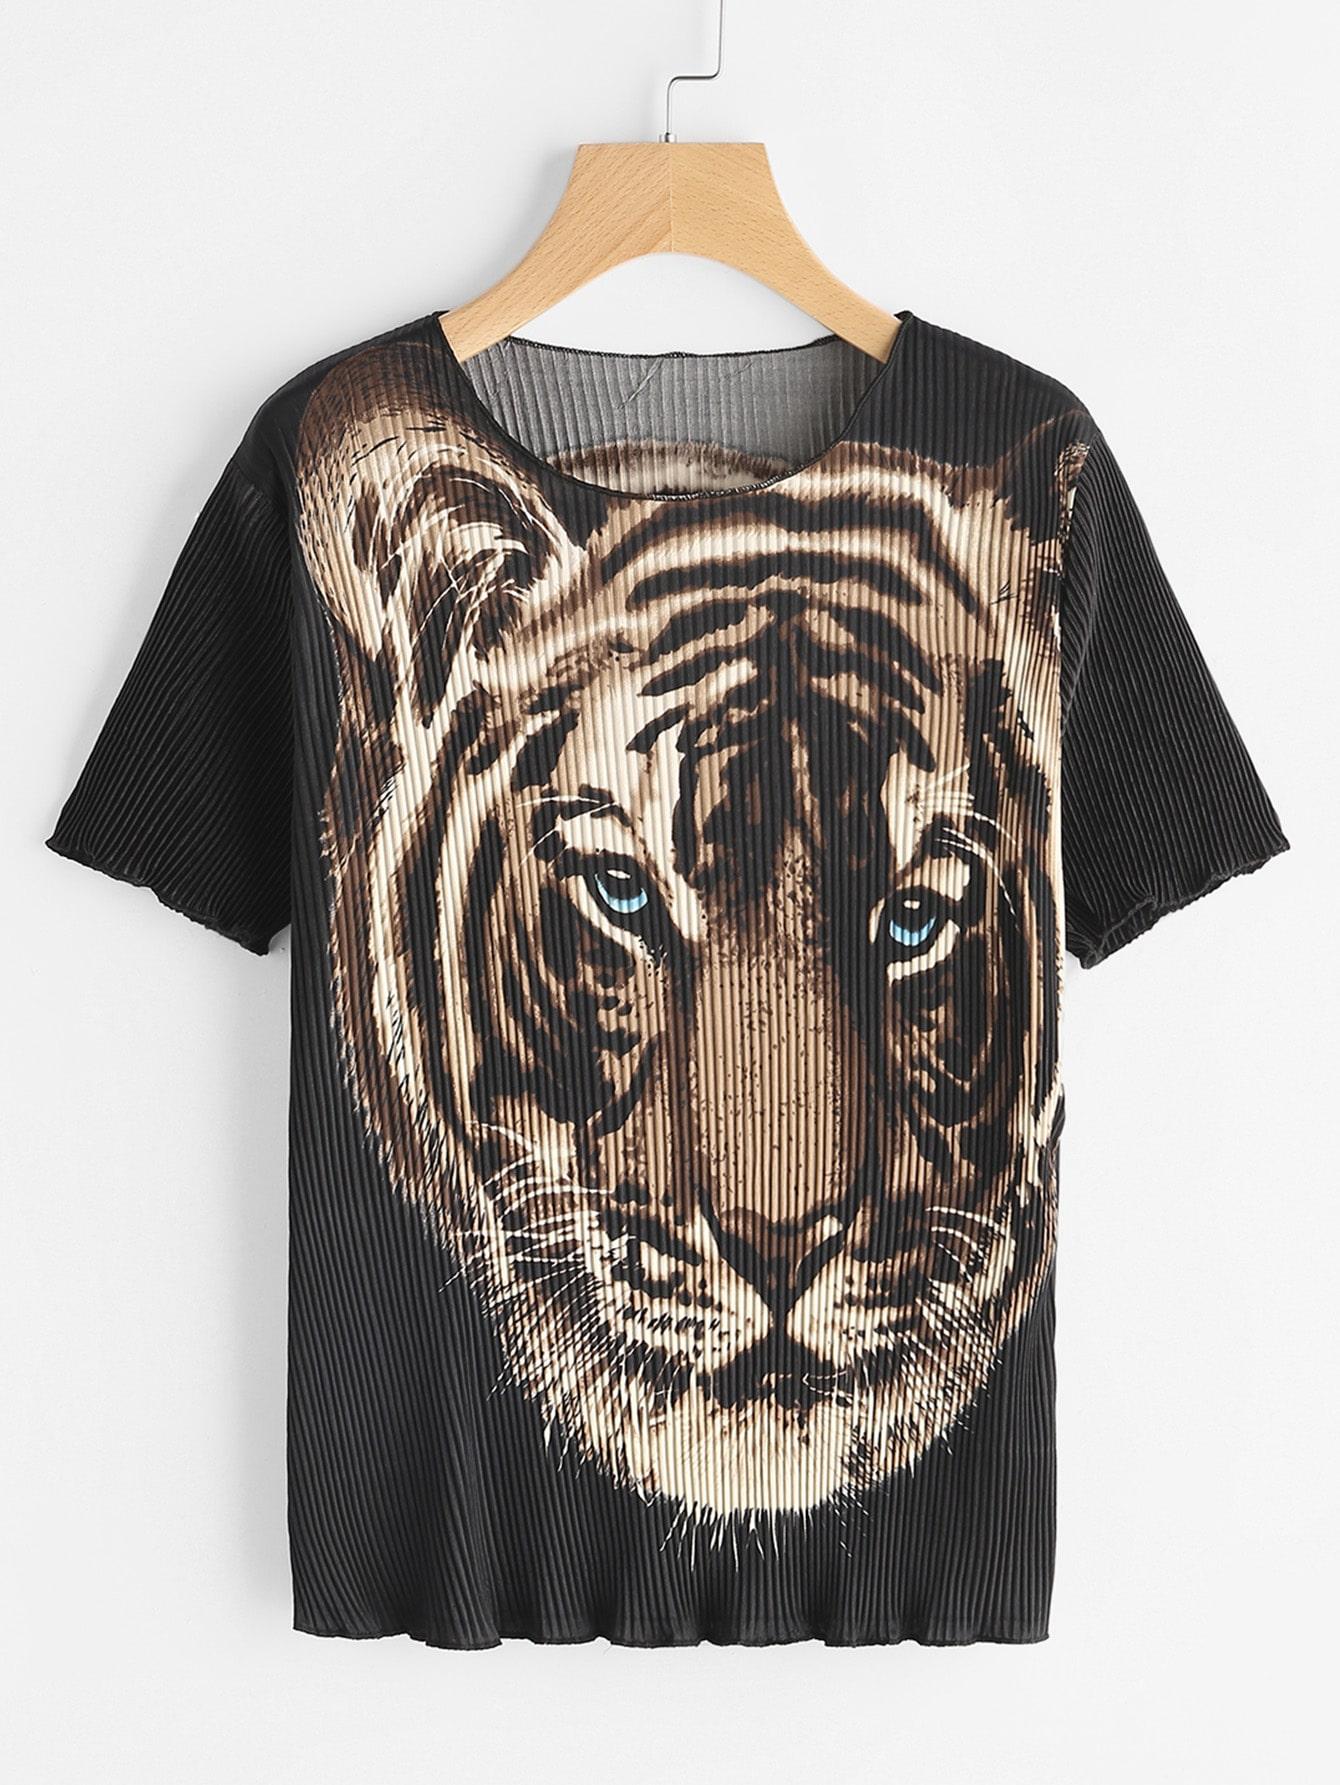 Tiger Print Ribbed Tee tee170413101